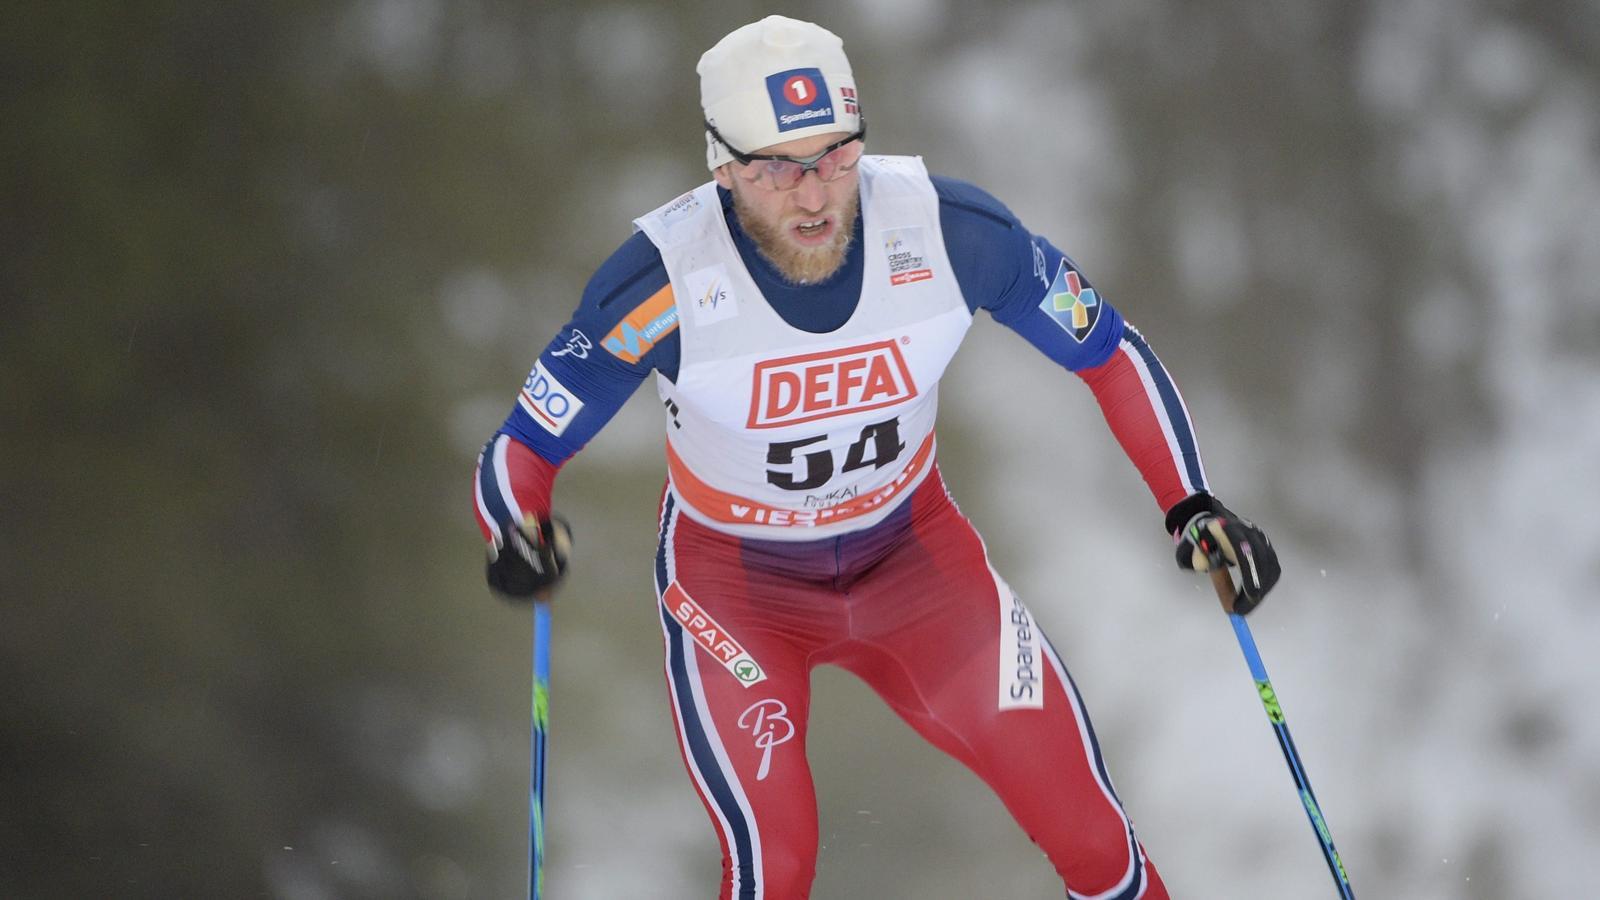 Sundby Doping